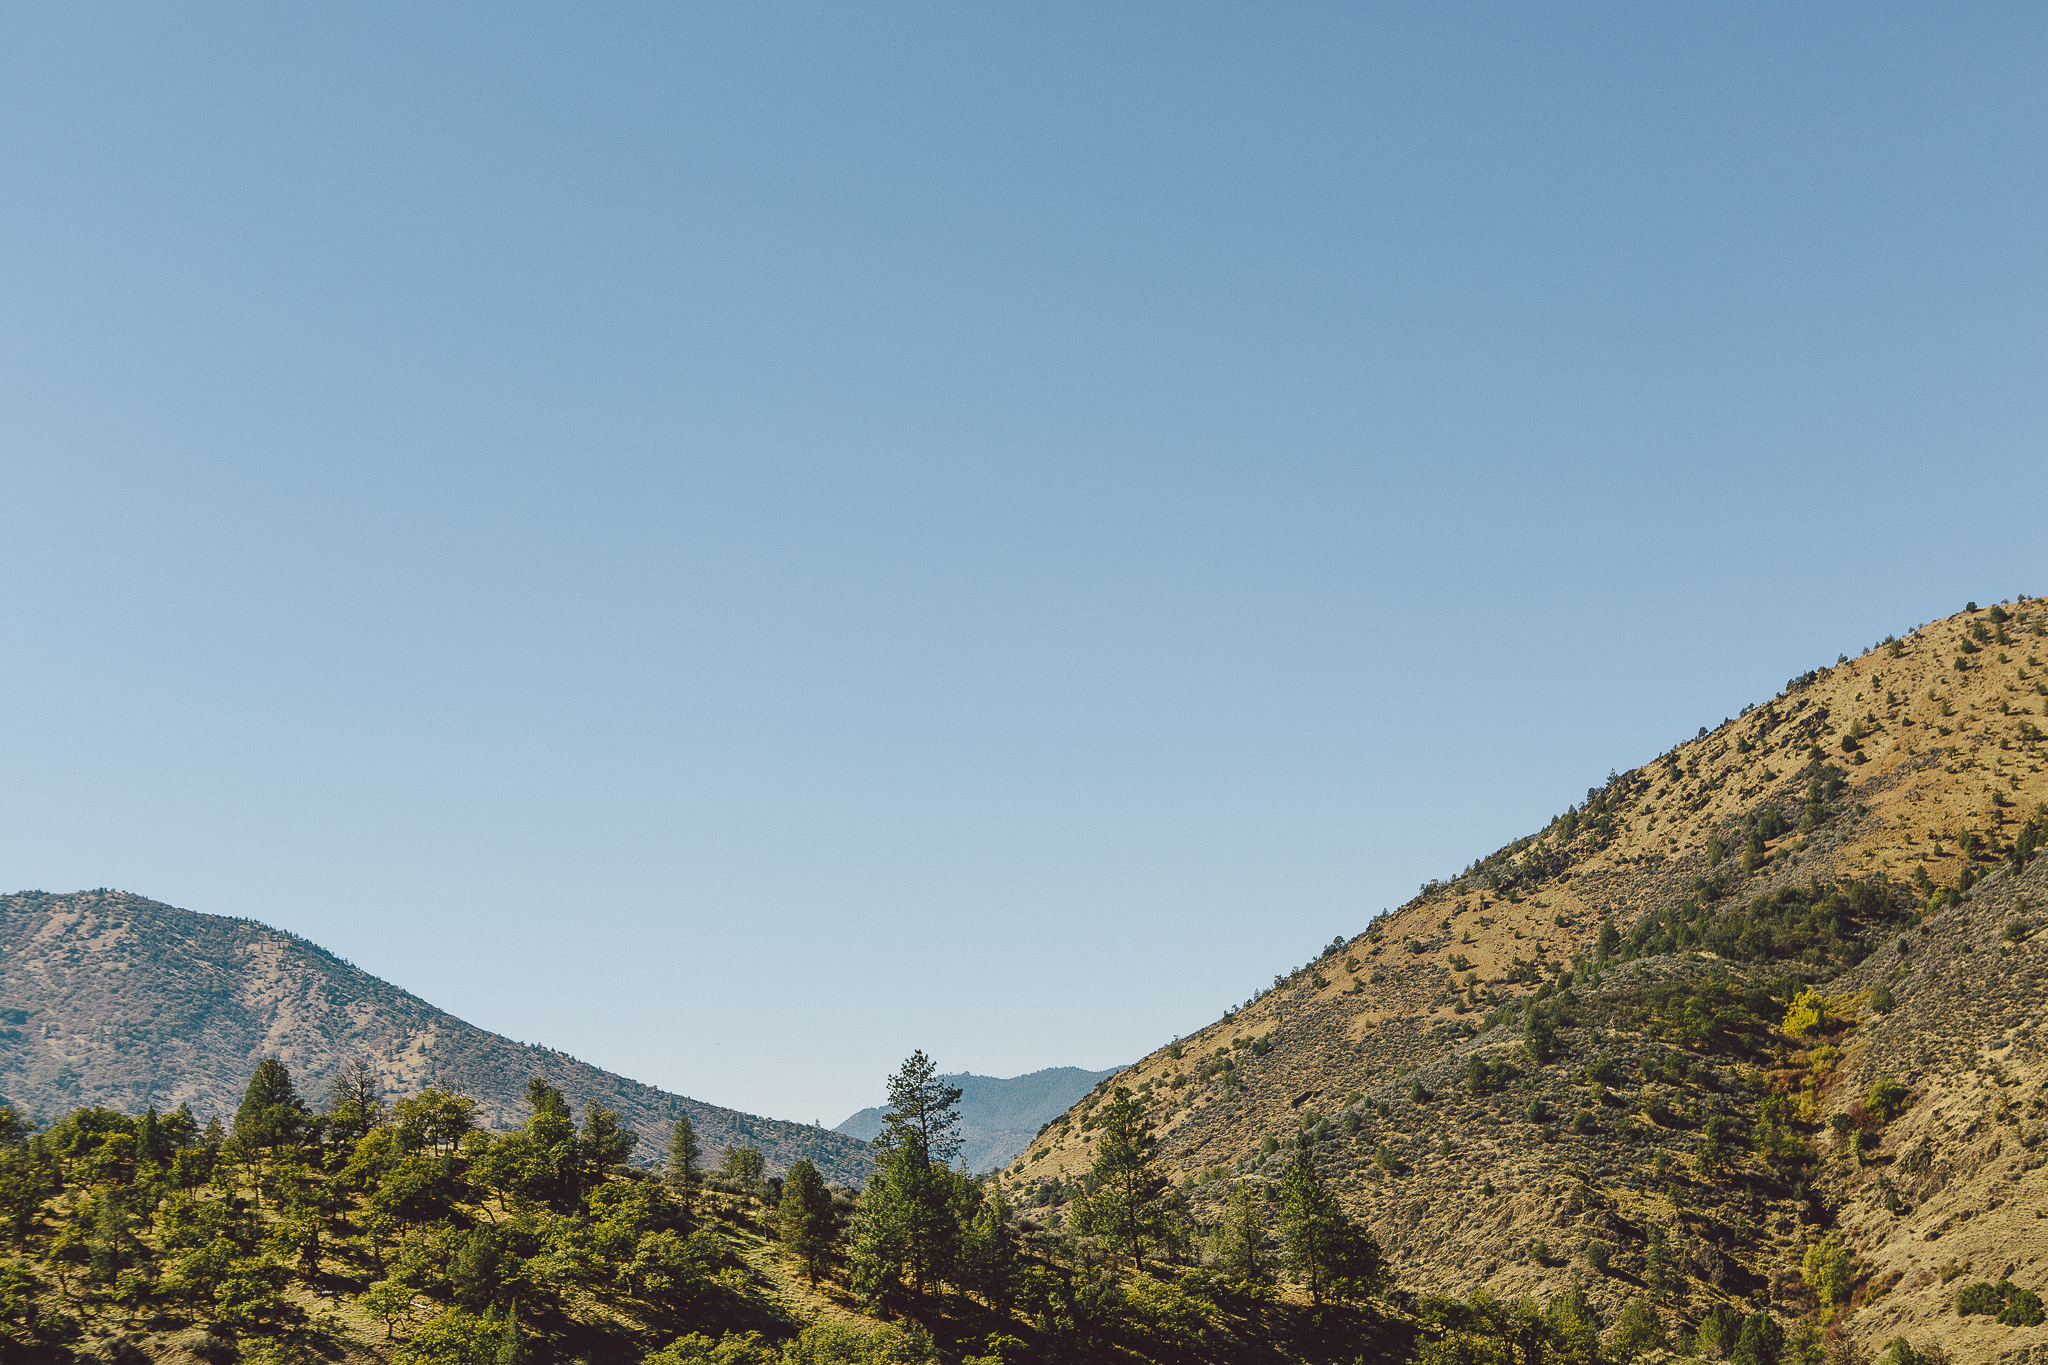 California travel photographer